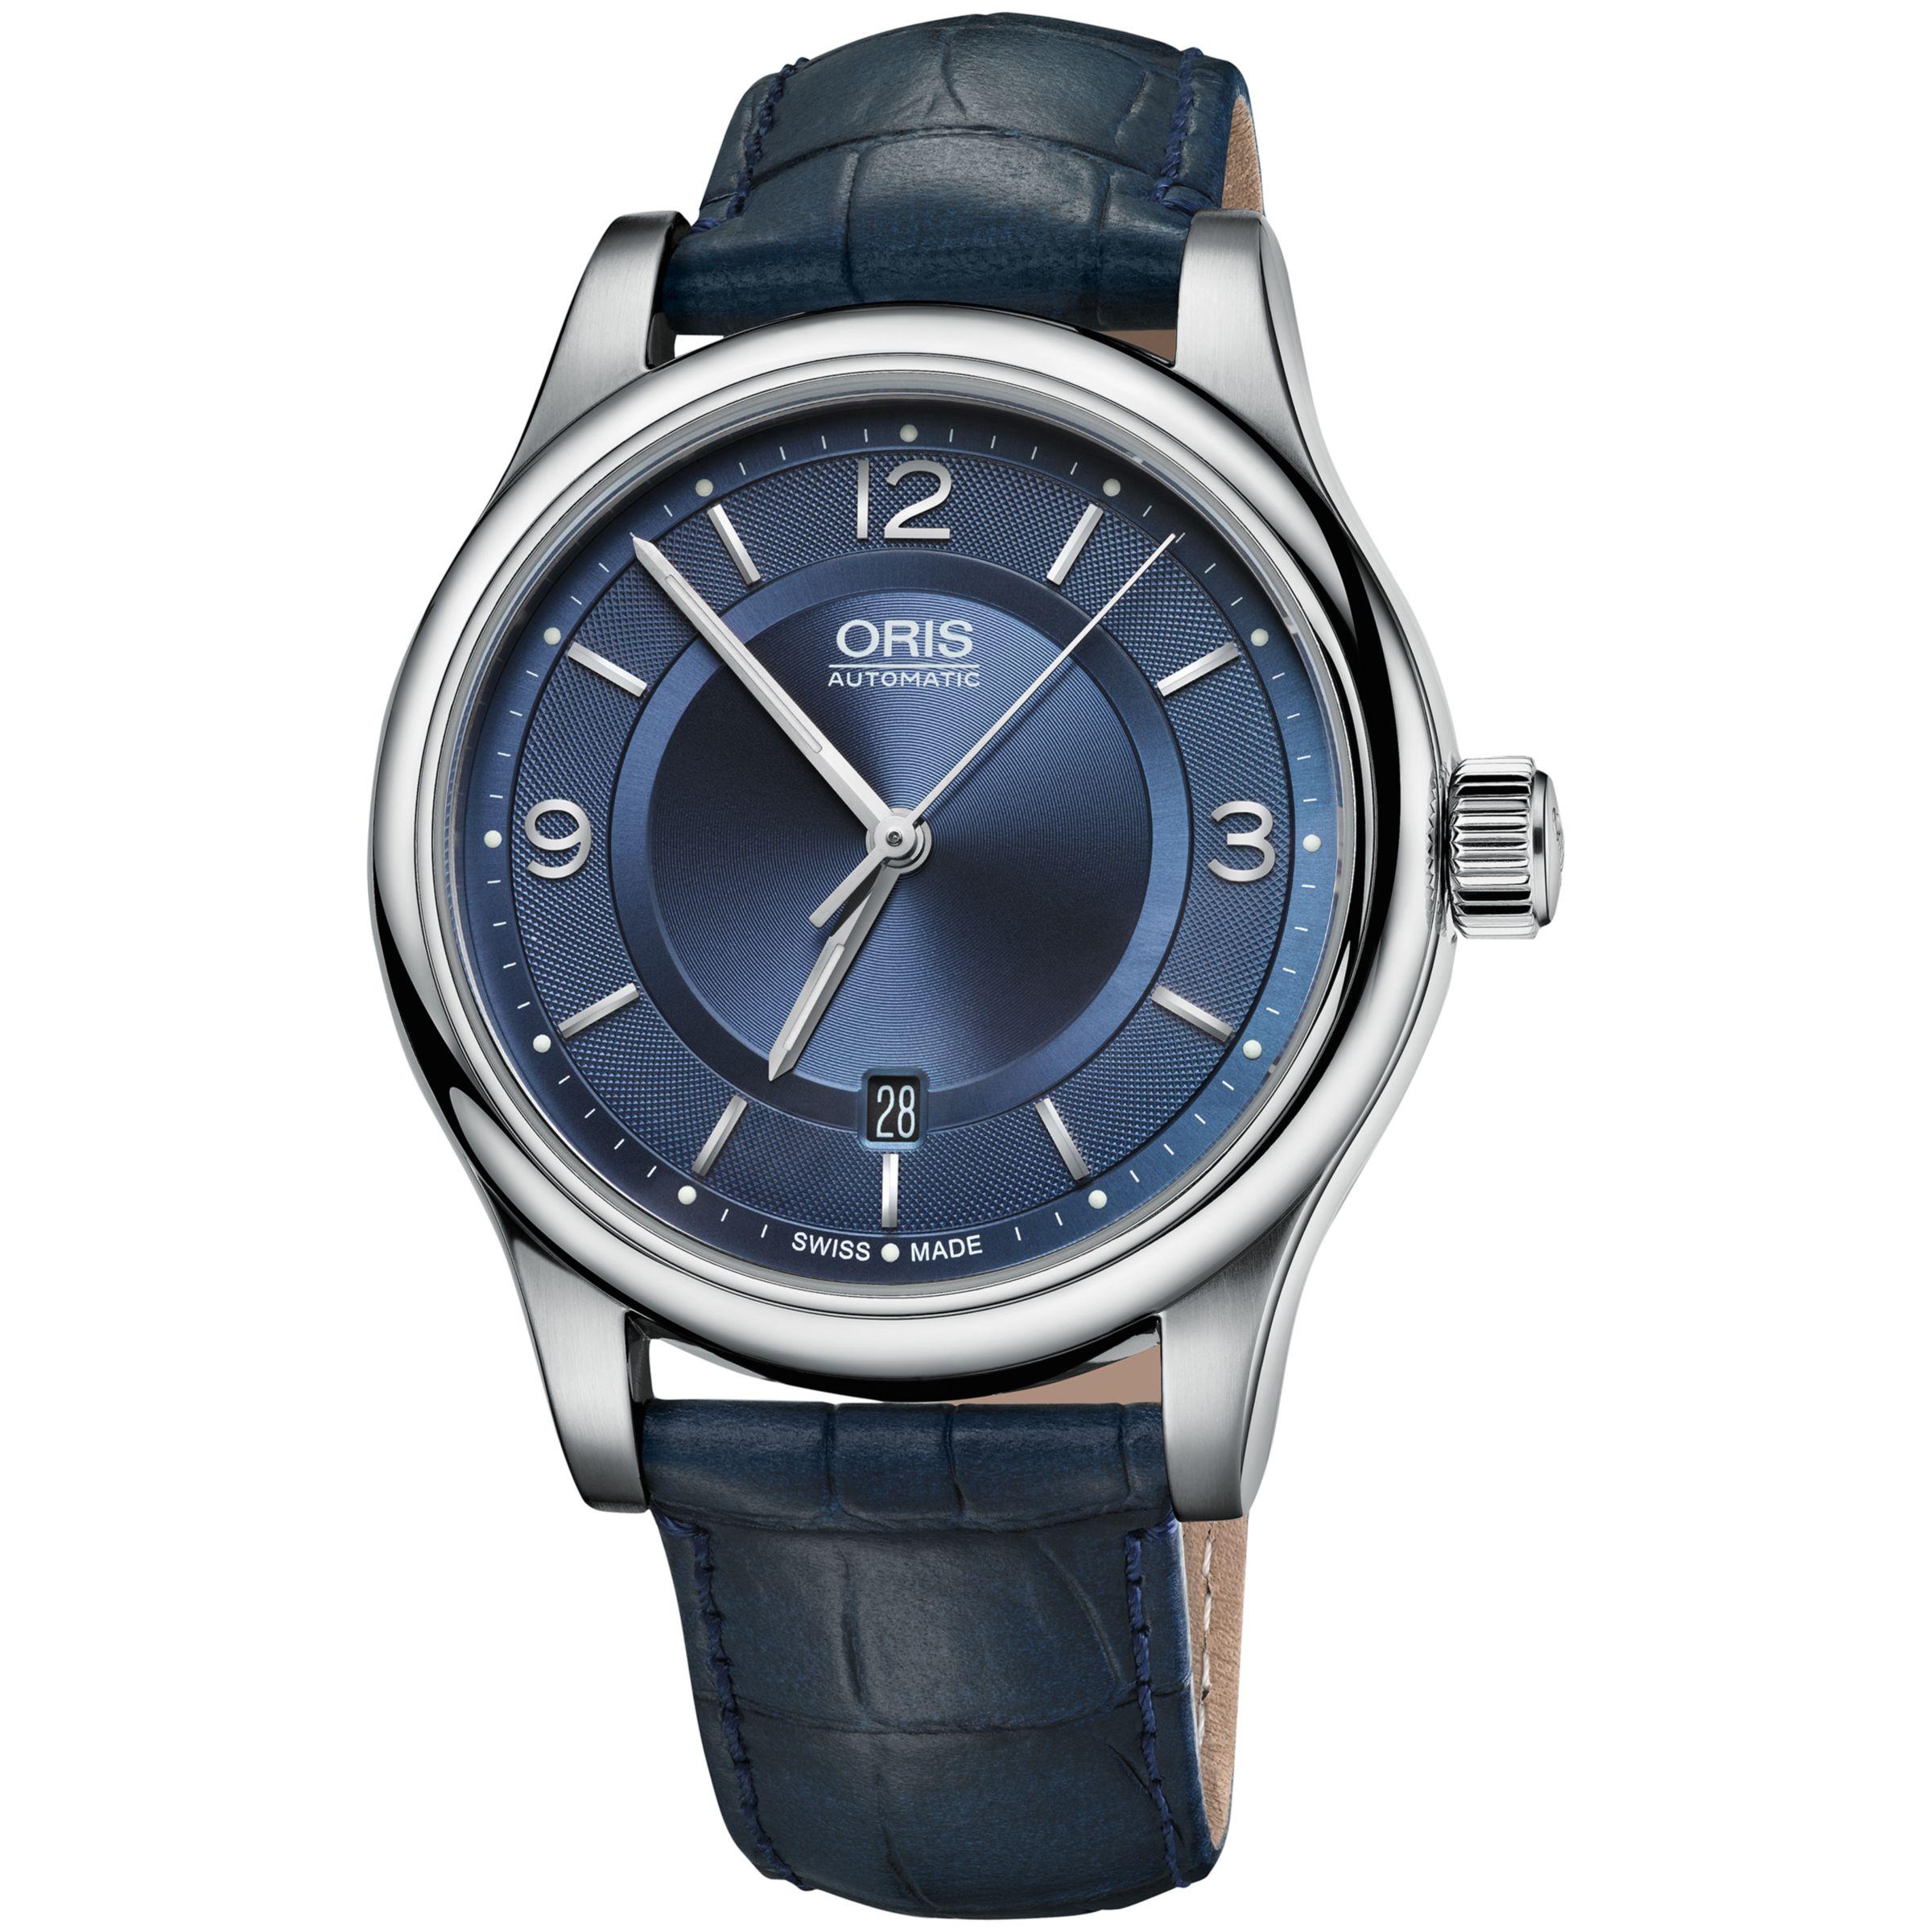 Oris Oris 01 733 7594 4035-07 5 20 85 Men's Classic Date Leather Strap Watch, Navy